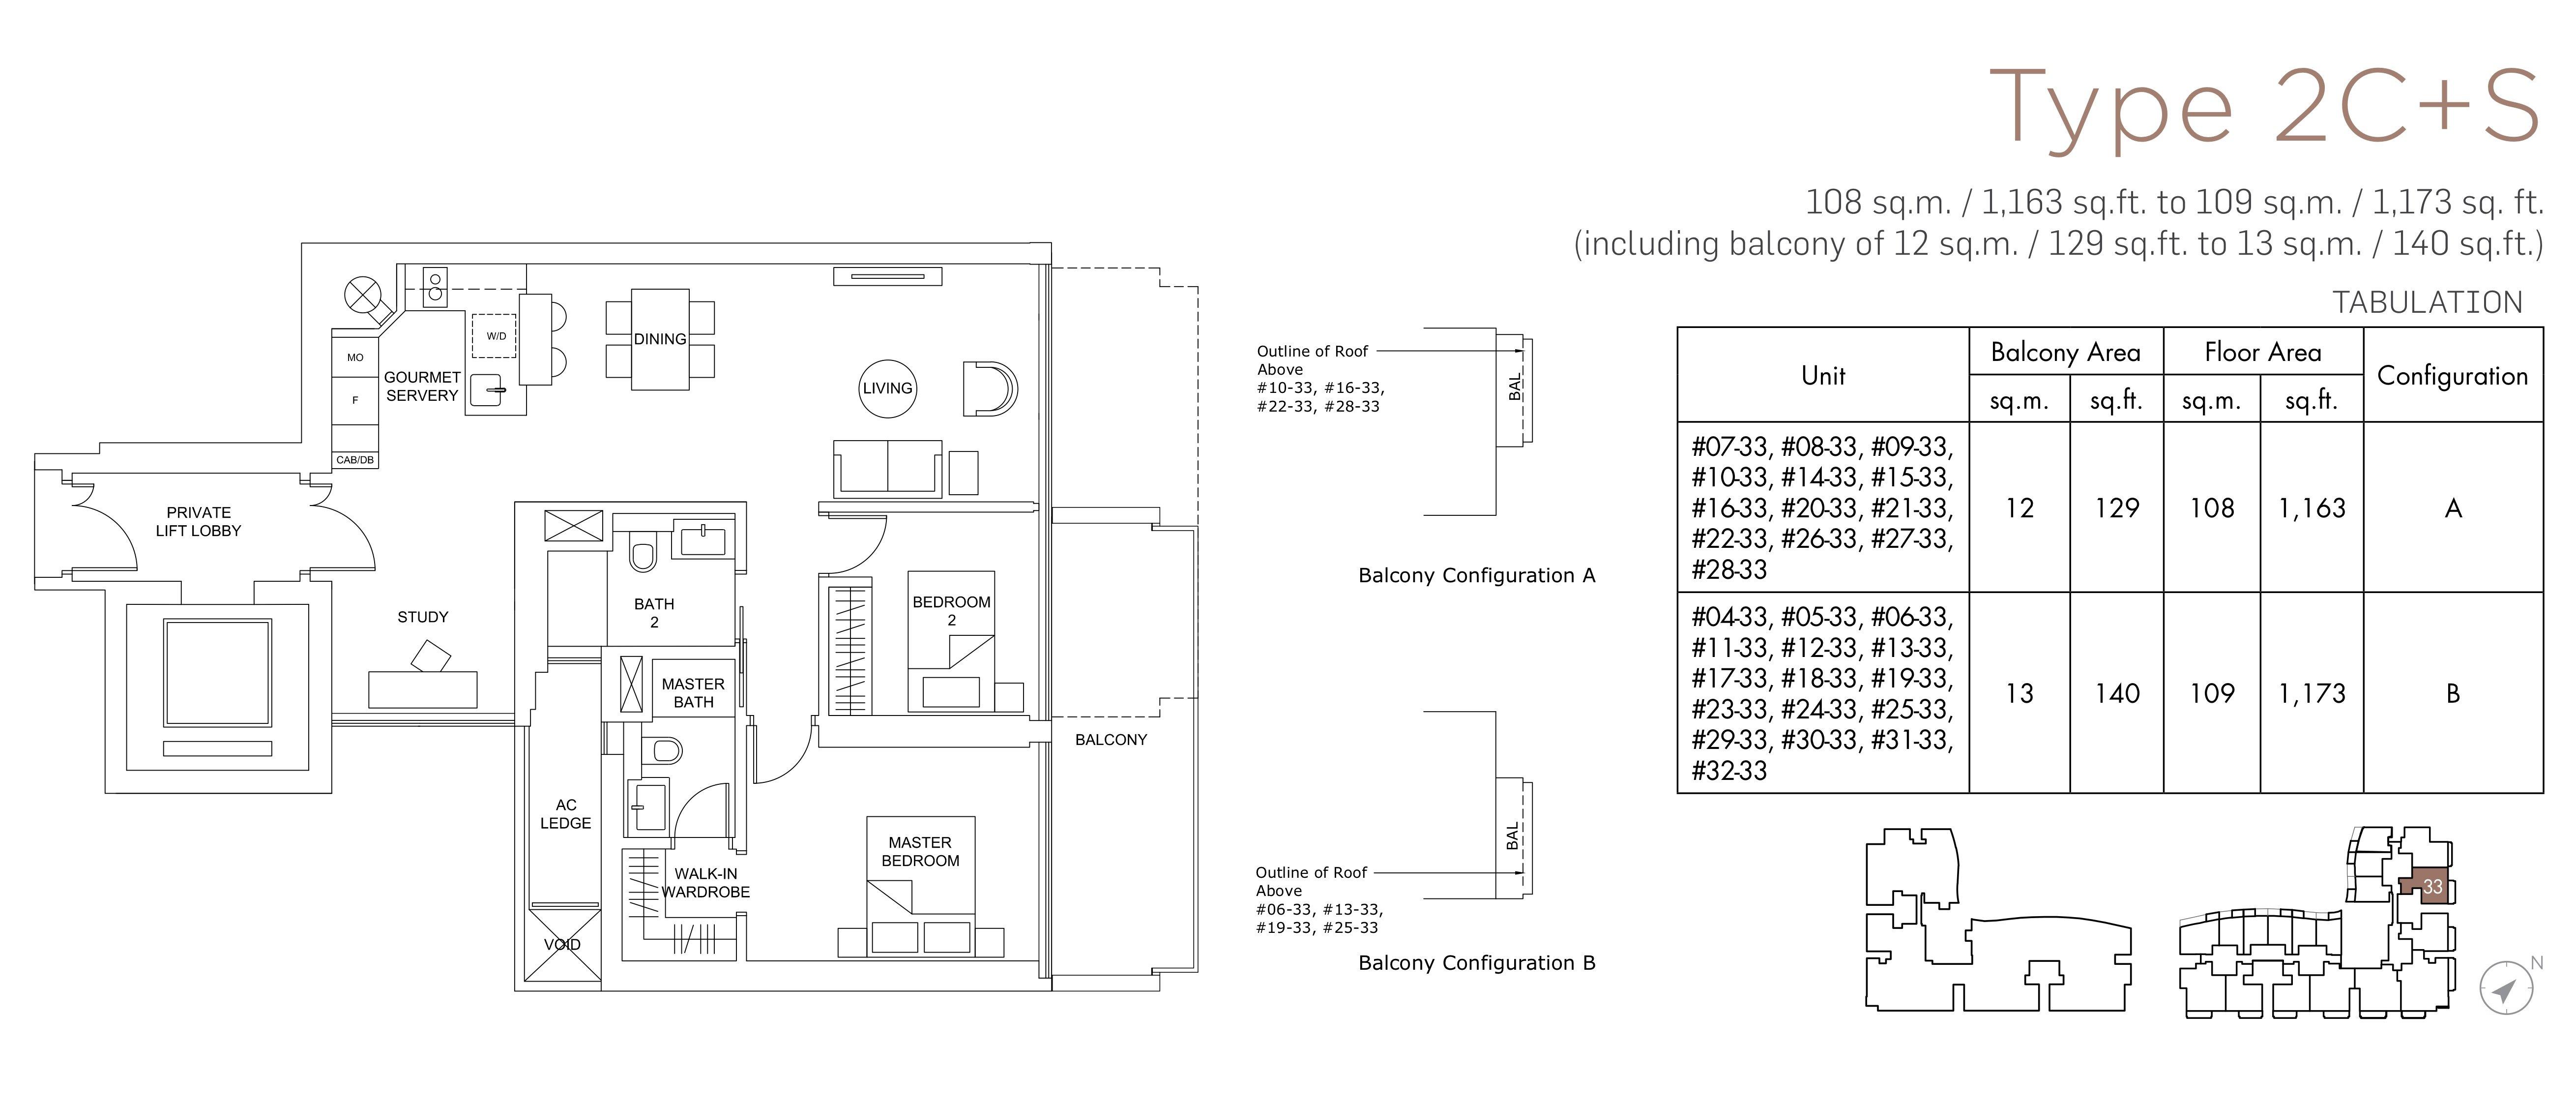 Marina One Residences 滨海盛景豪苑 floor plans 2 bedroom +study 2C+S